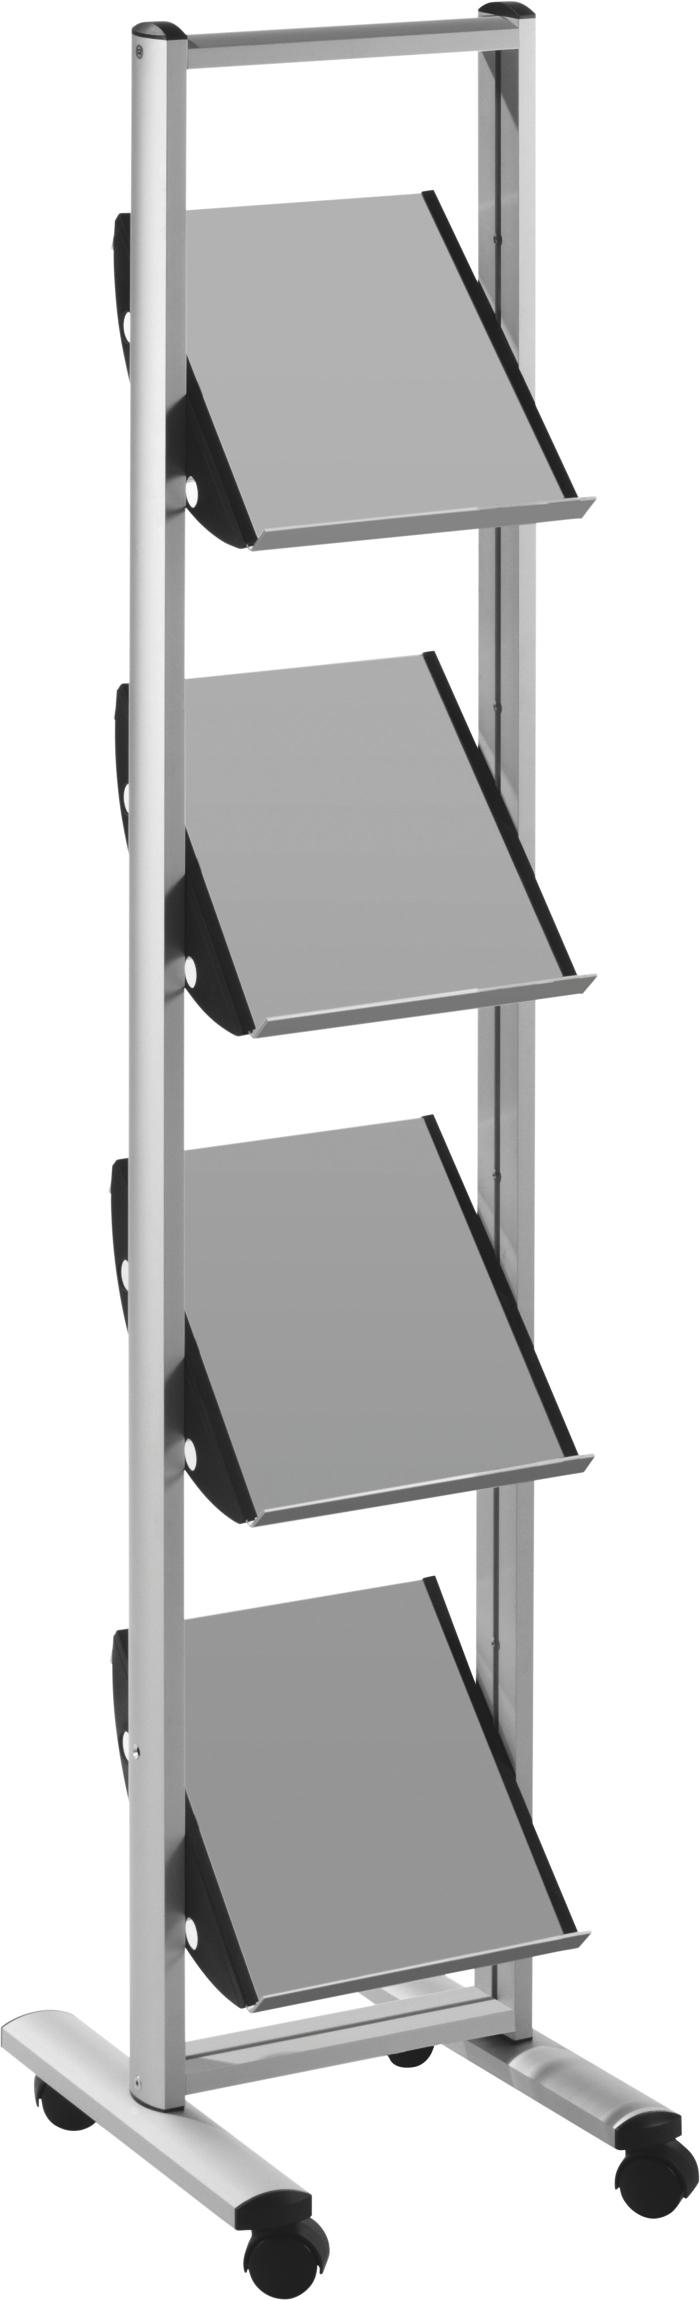 helit © Prospektregal schmal 4 x A4 aus Acryl oder Metall 02